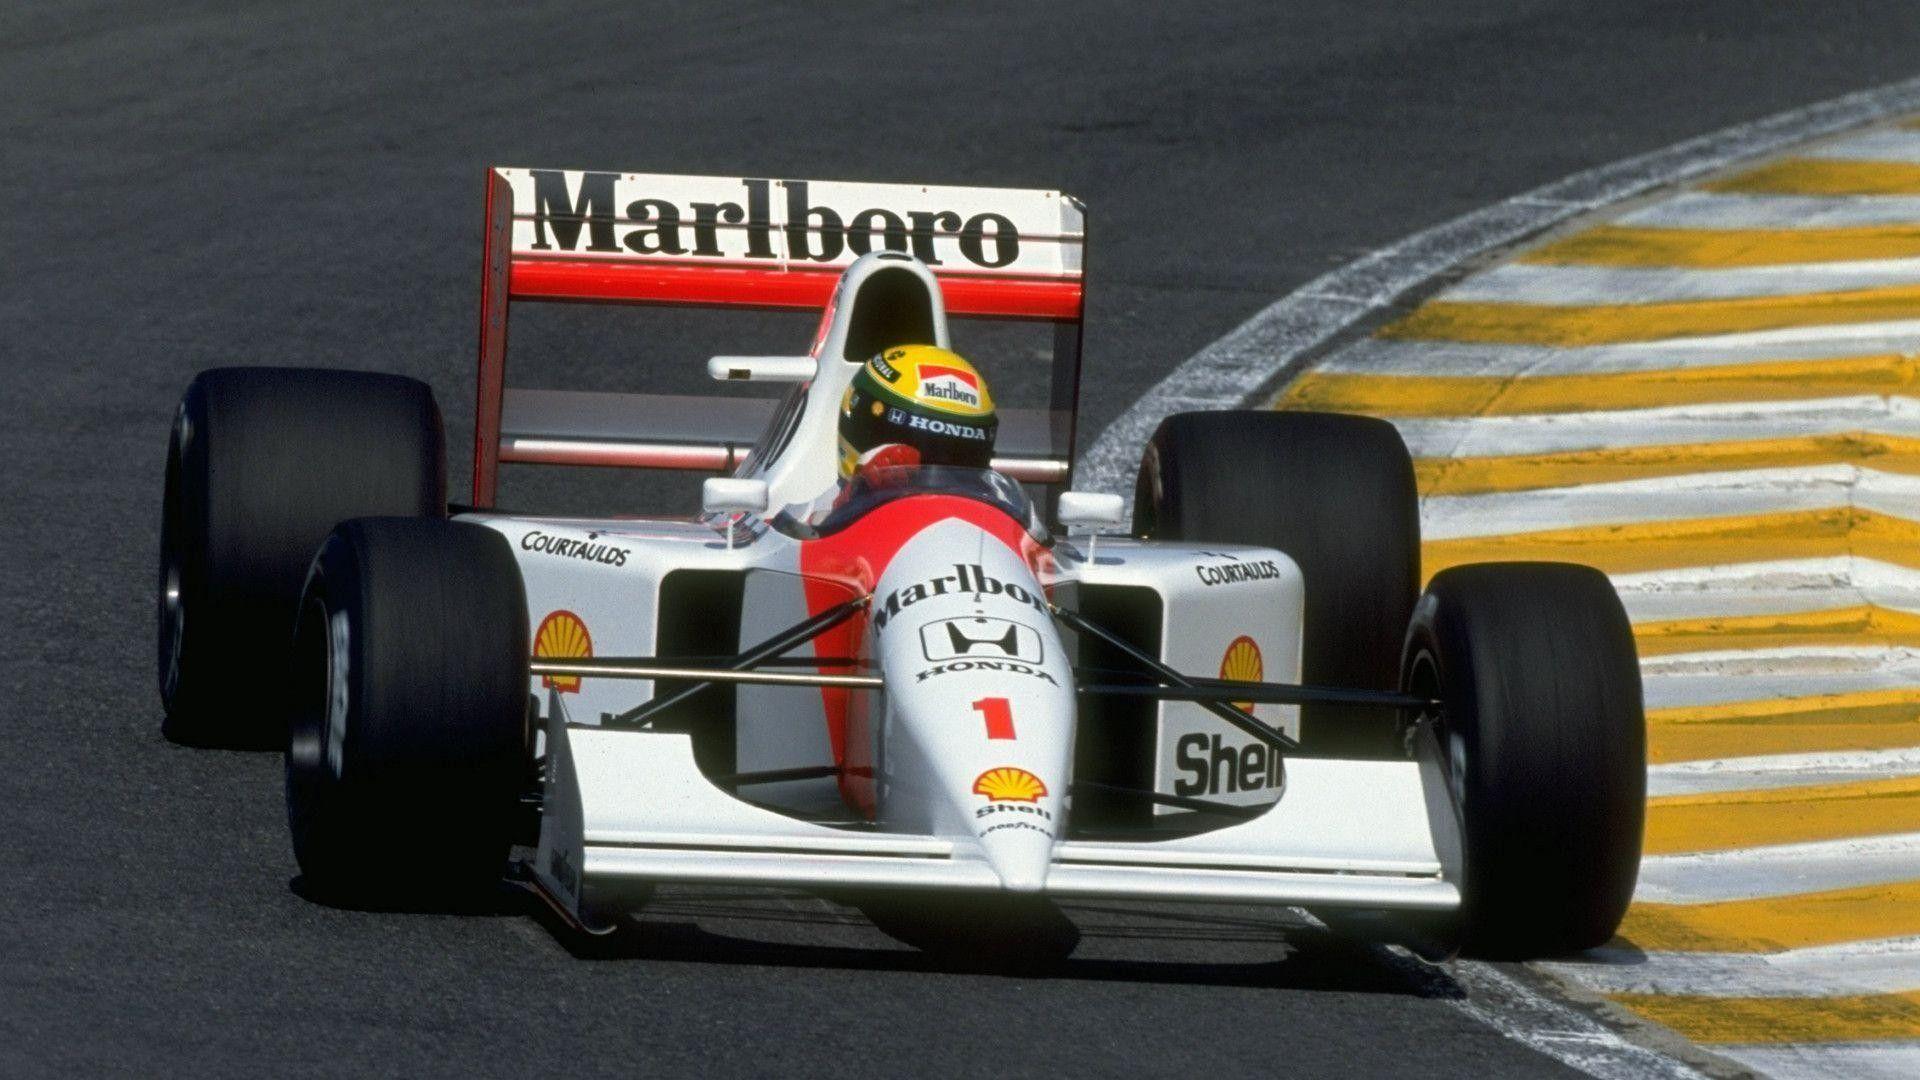 70 Ayrton Senna Wallpapers On Wallpaperplay Ayrton Senna